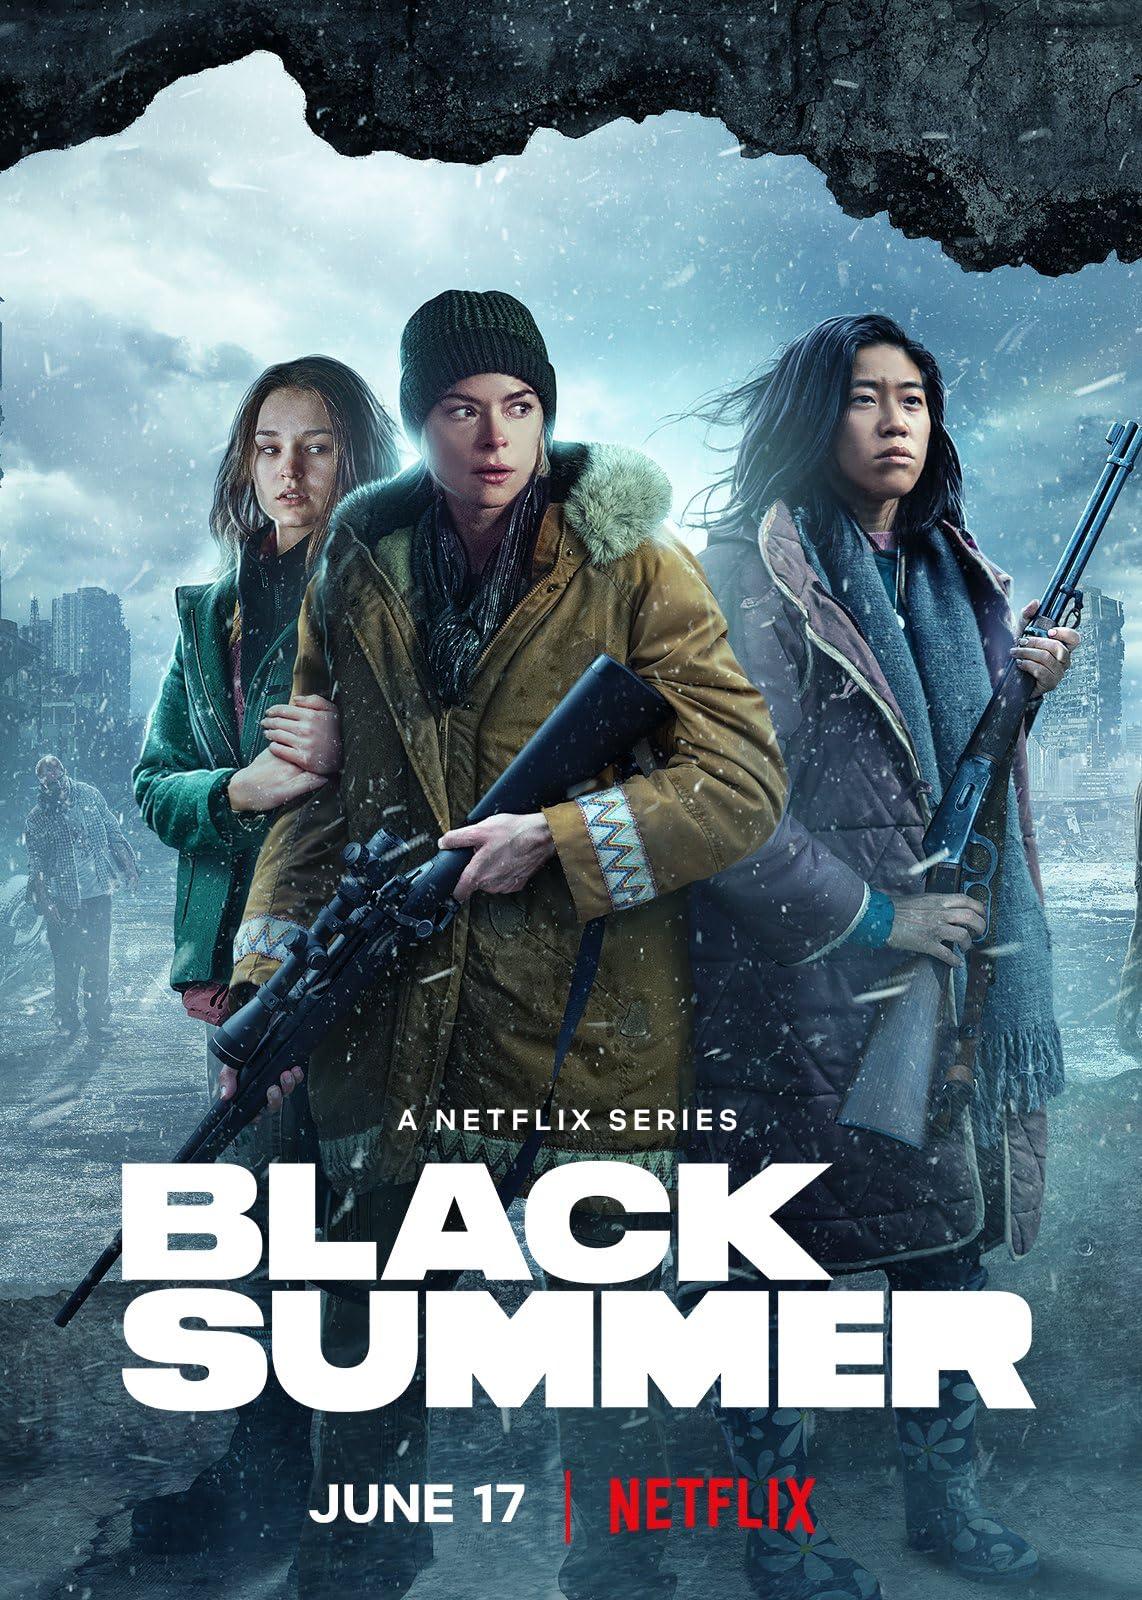 Black Summer S02 2021 Hindi Dubbed Complete Netflix Web Series 720p HDRip 2.4GB | 1.14GB Download